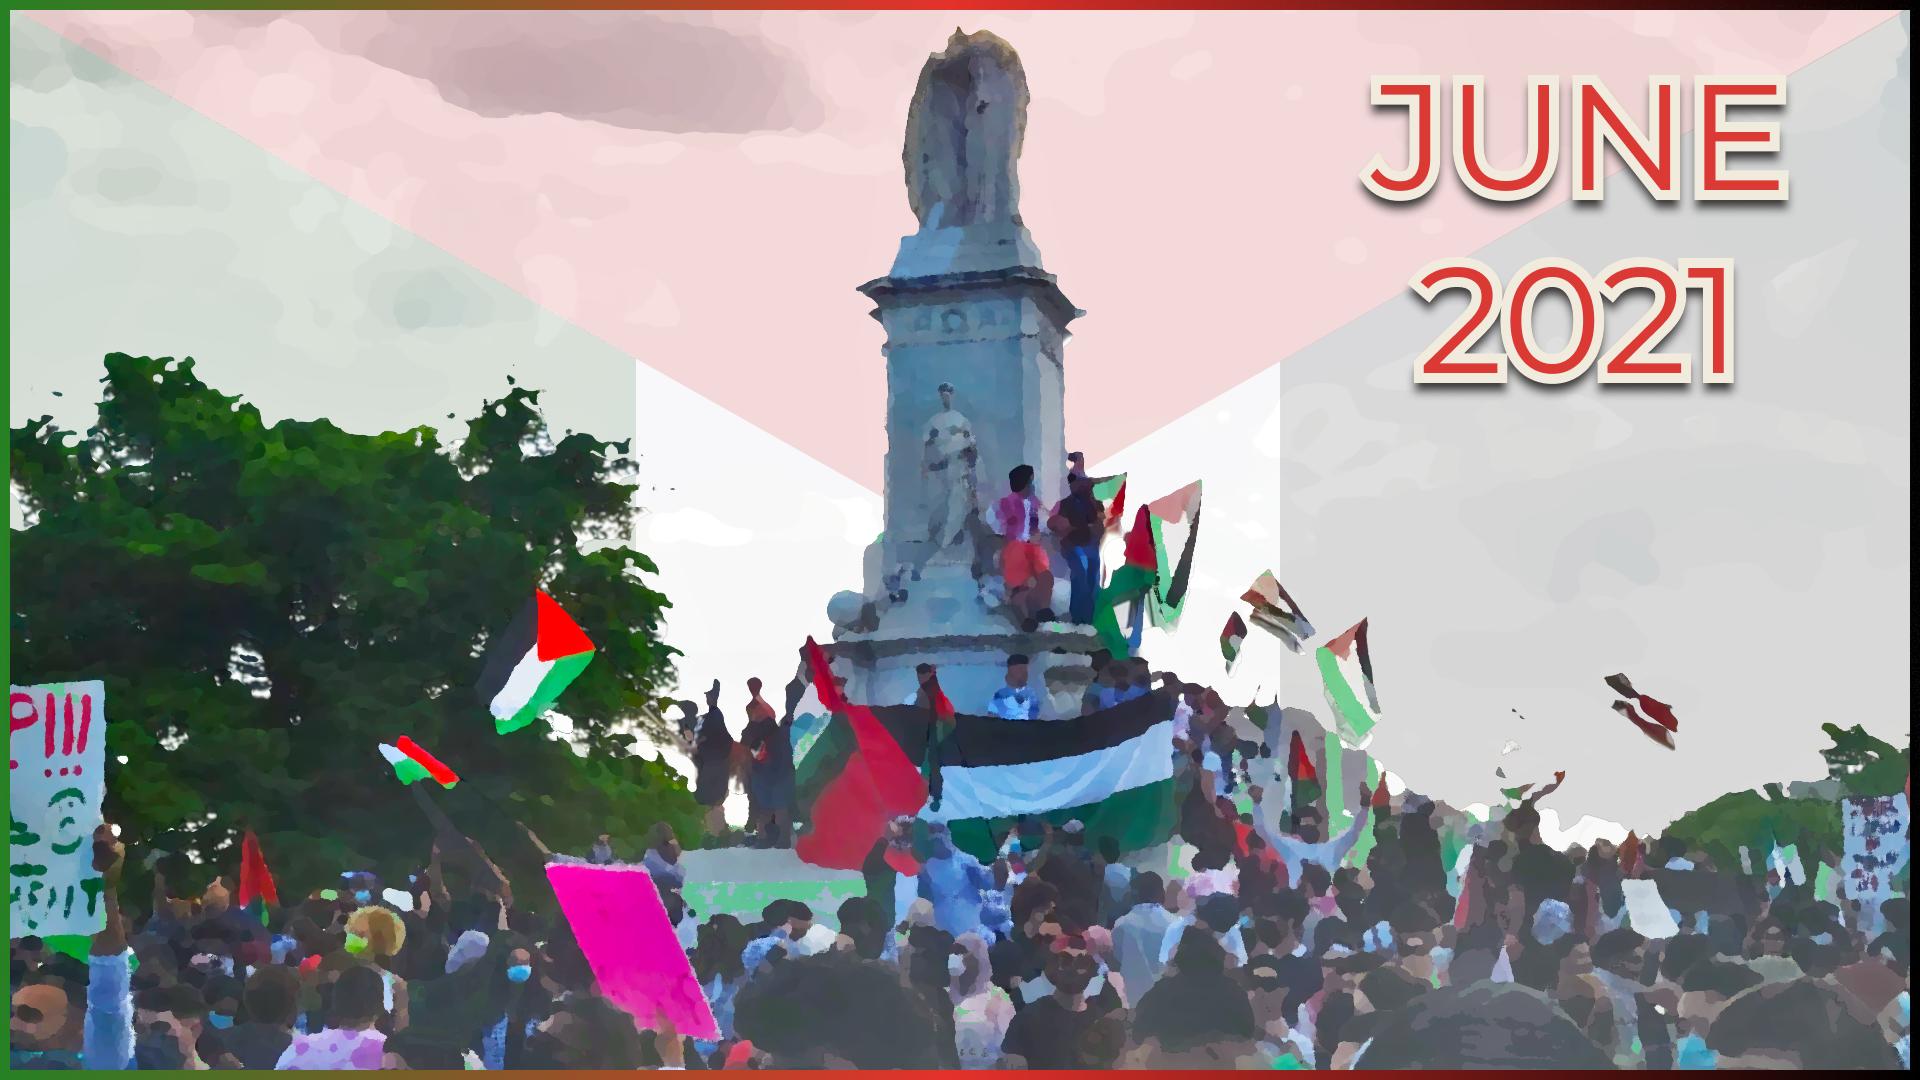 JUNE 2021 banner